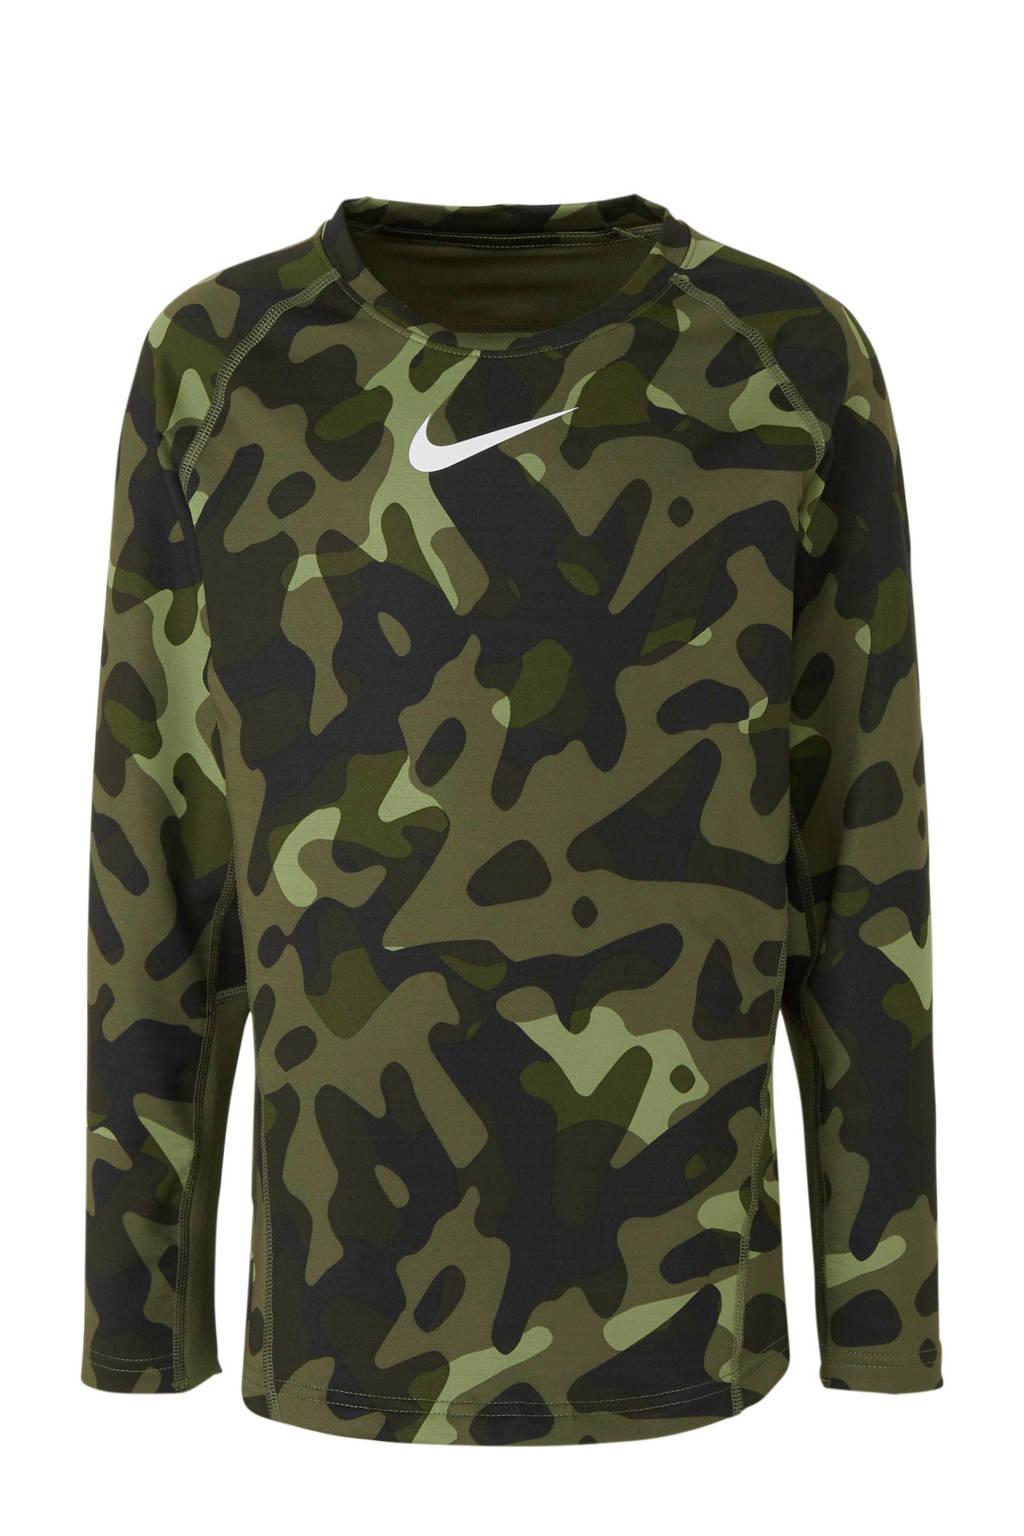 Nike   Pro Warm sport T-shirt camouflage, Groen camouflage